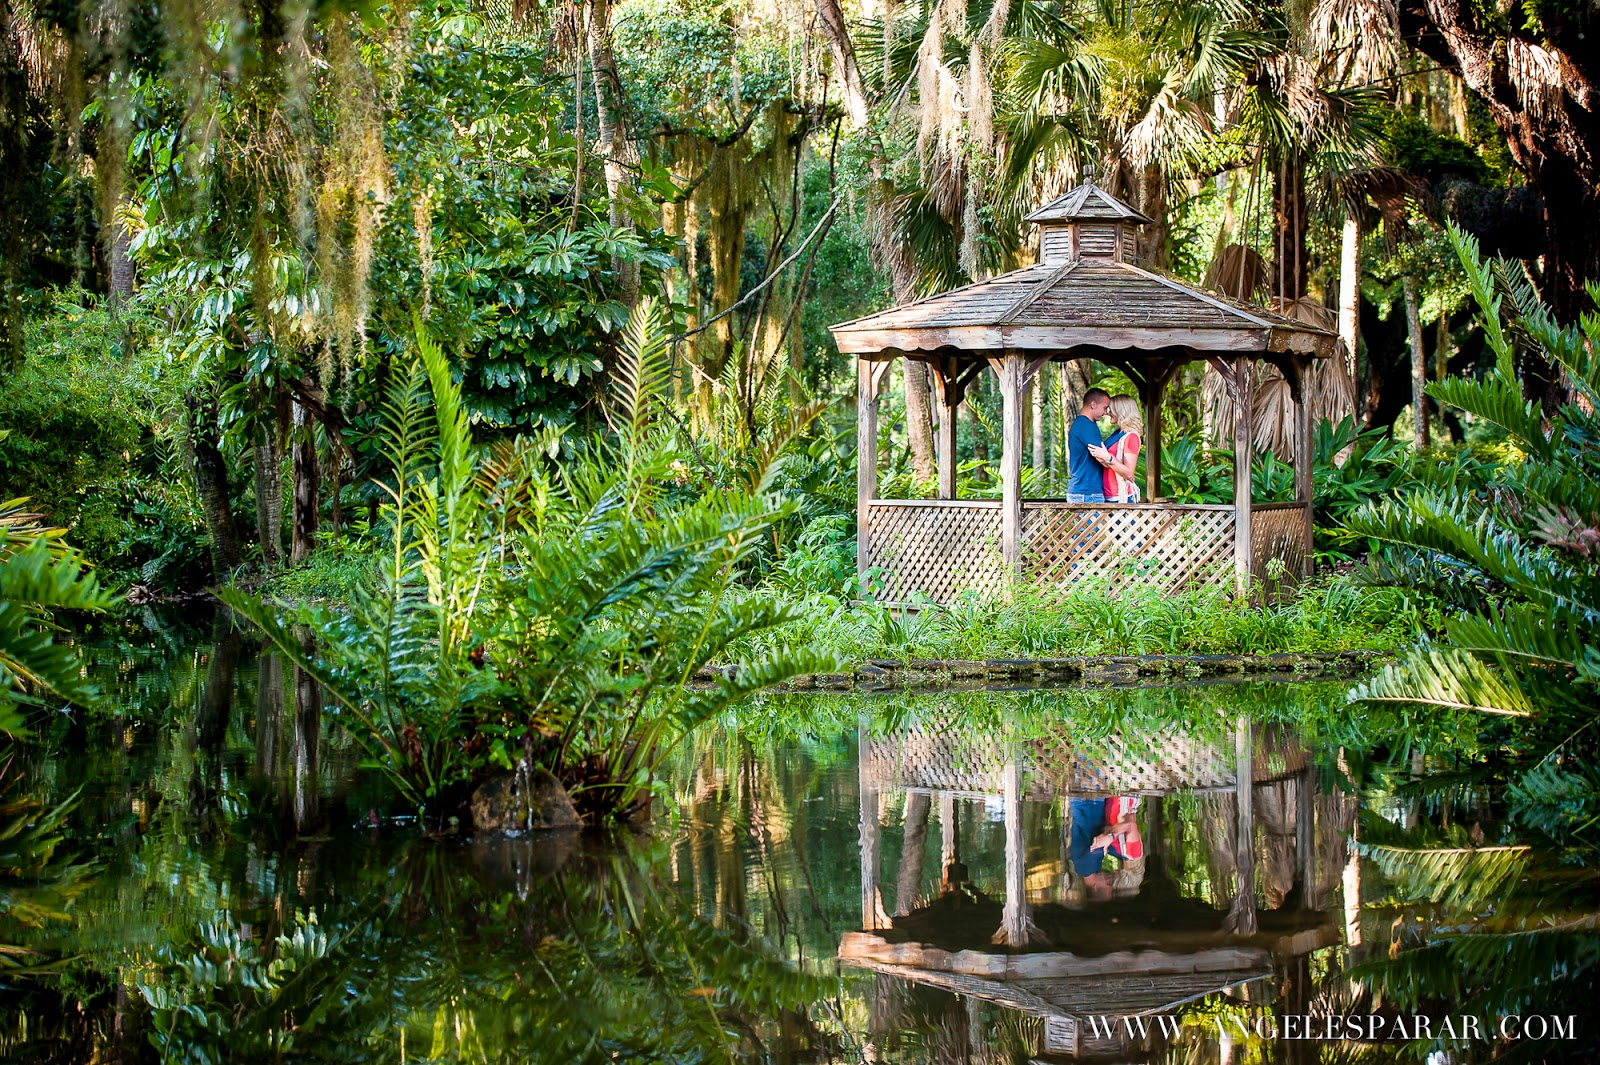 Brooke And Heath 39 S Engagement Session Washington Oaks State Park Palm Coast Fl Jacksonville